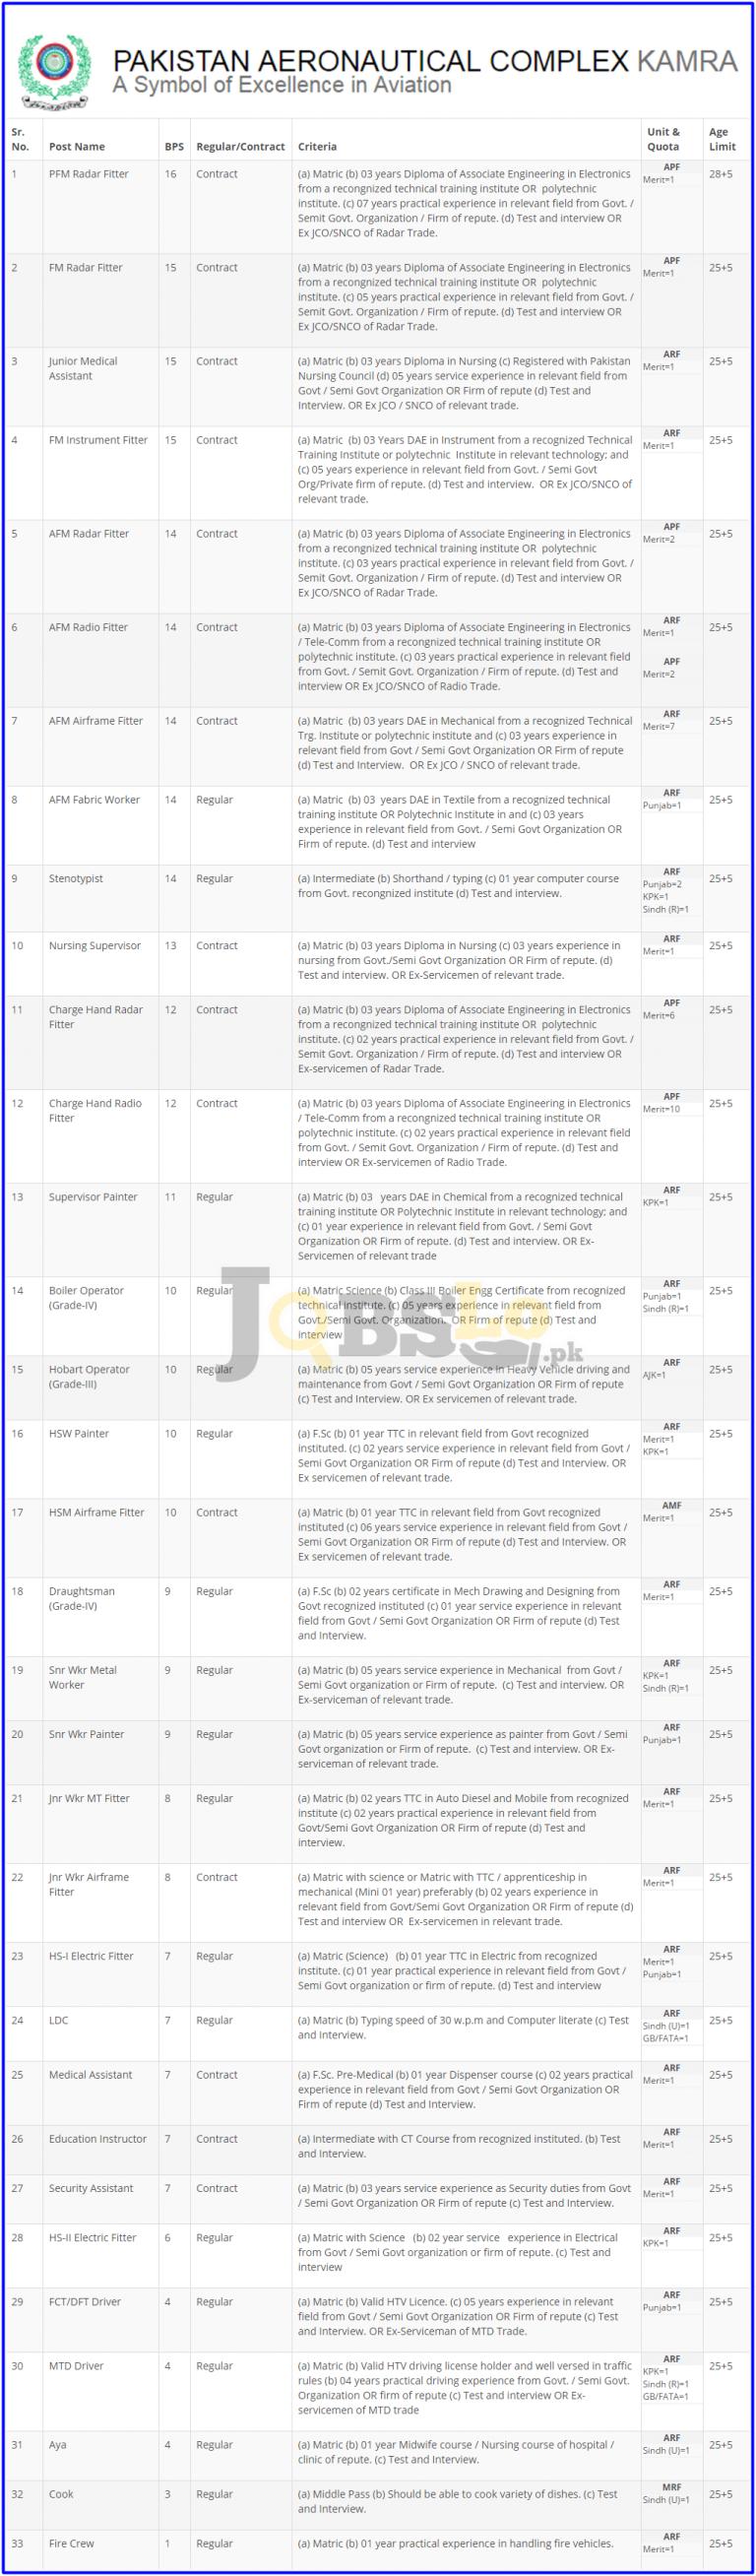 Pakistan Aeronautical Complex Kamra Jobs 2016 Latest Employment Offers